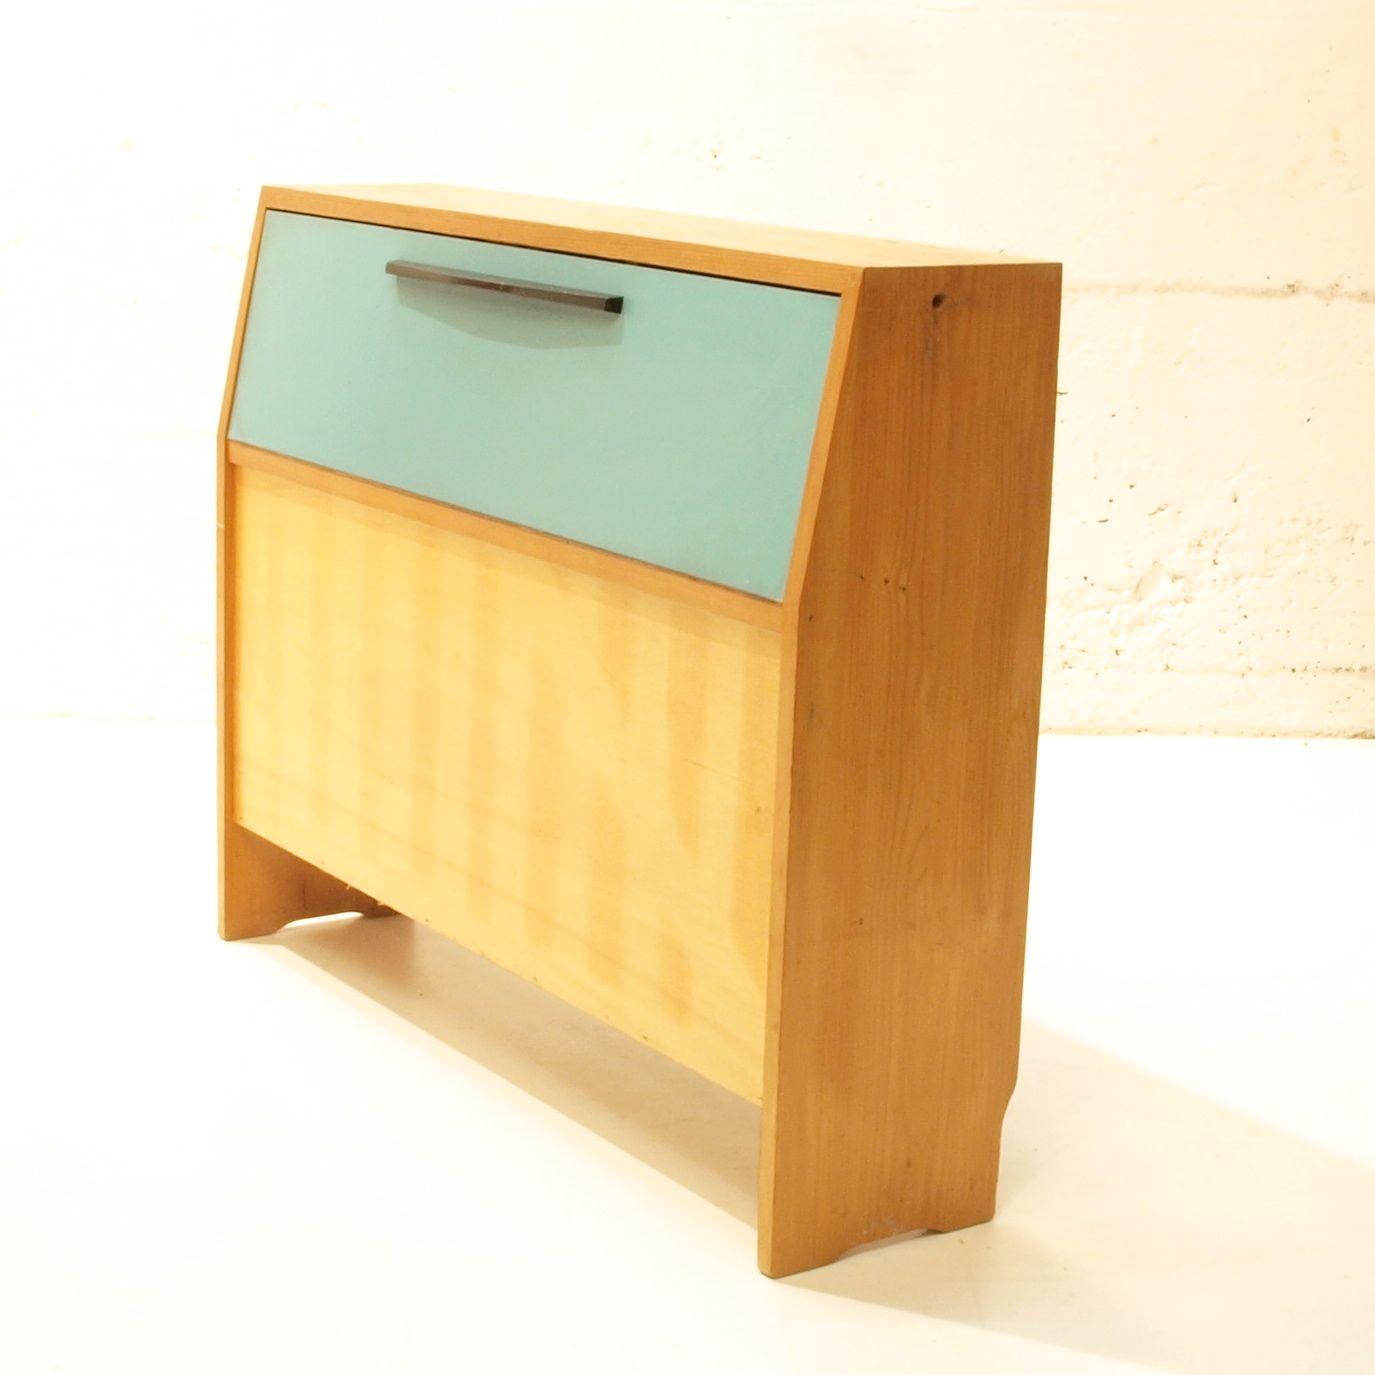 pet dosen altglas m bel mit unterteilung m bel. Black Bedroom Furniture Sets. Home Design Ideas